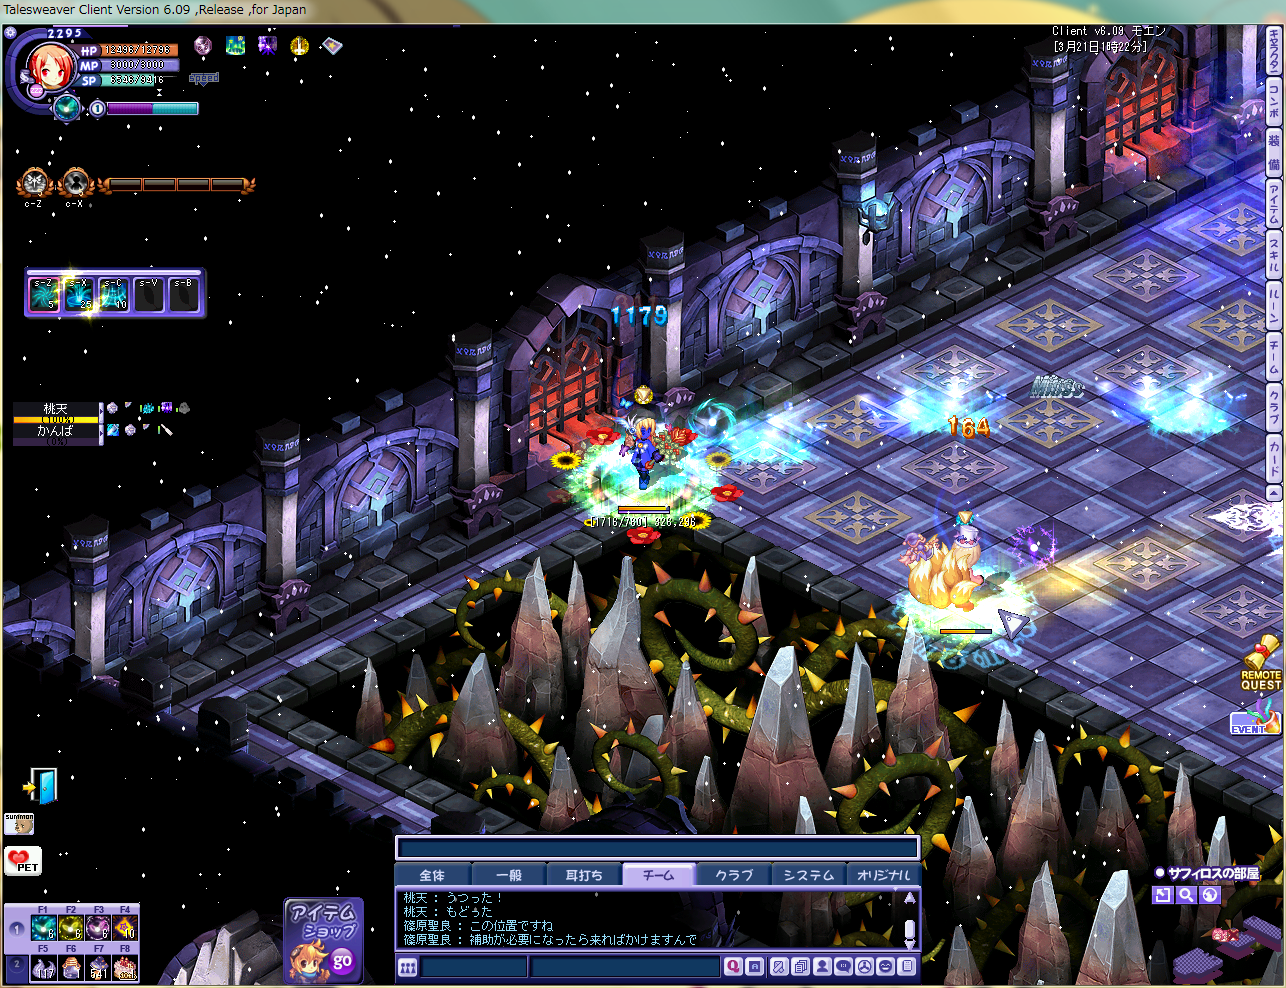 screenshot271.png